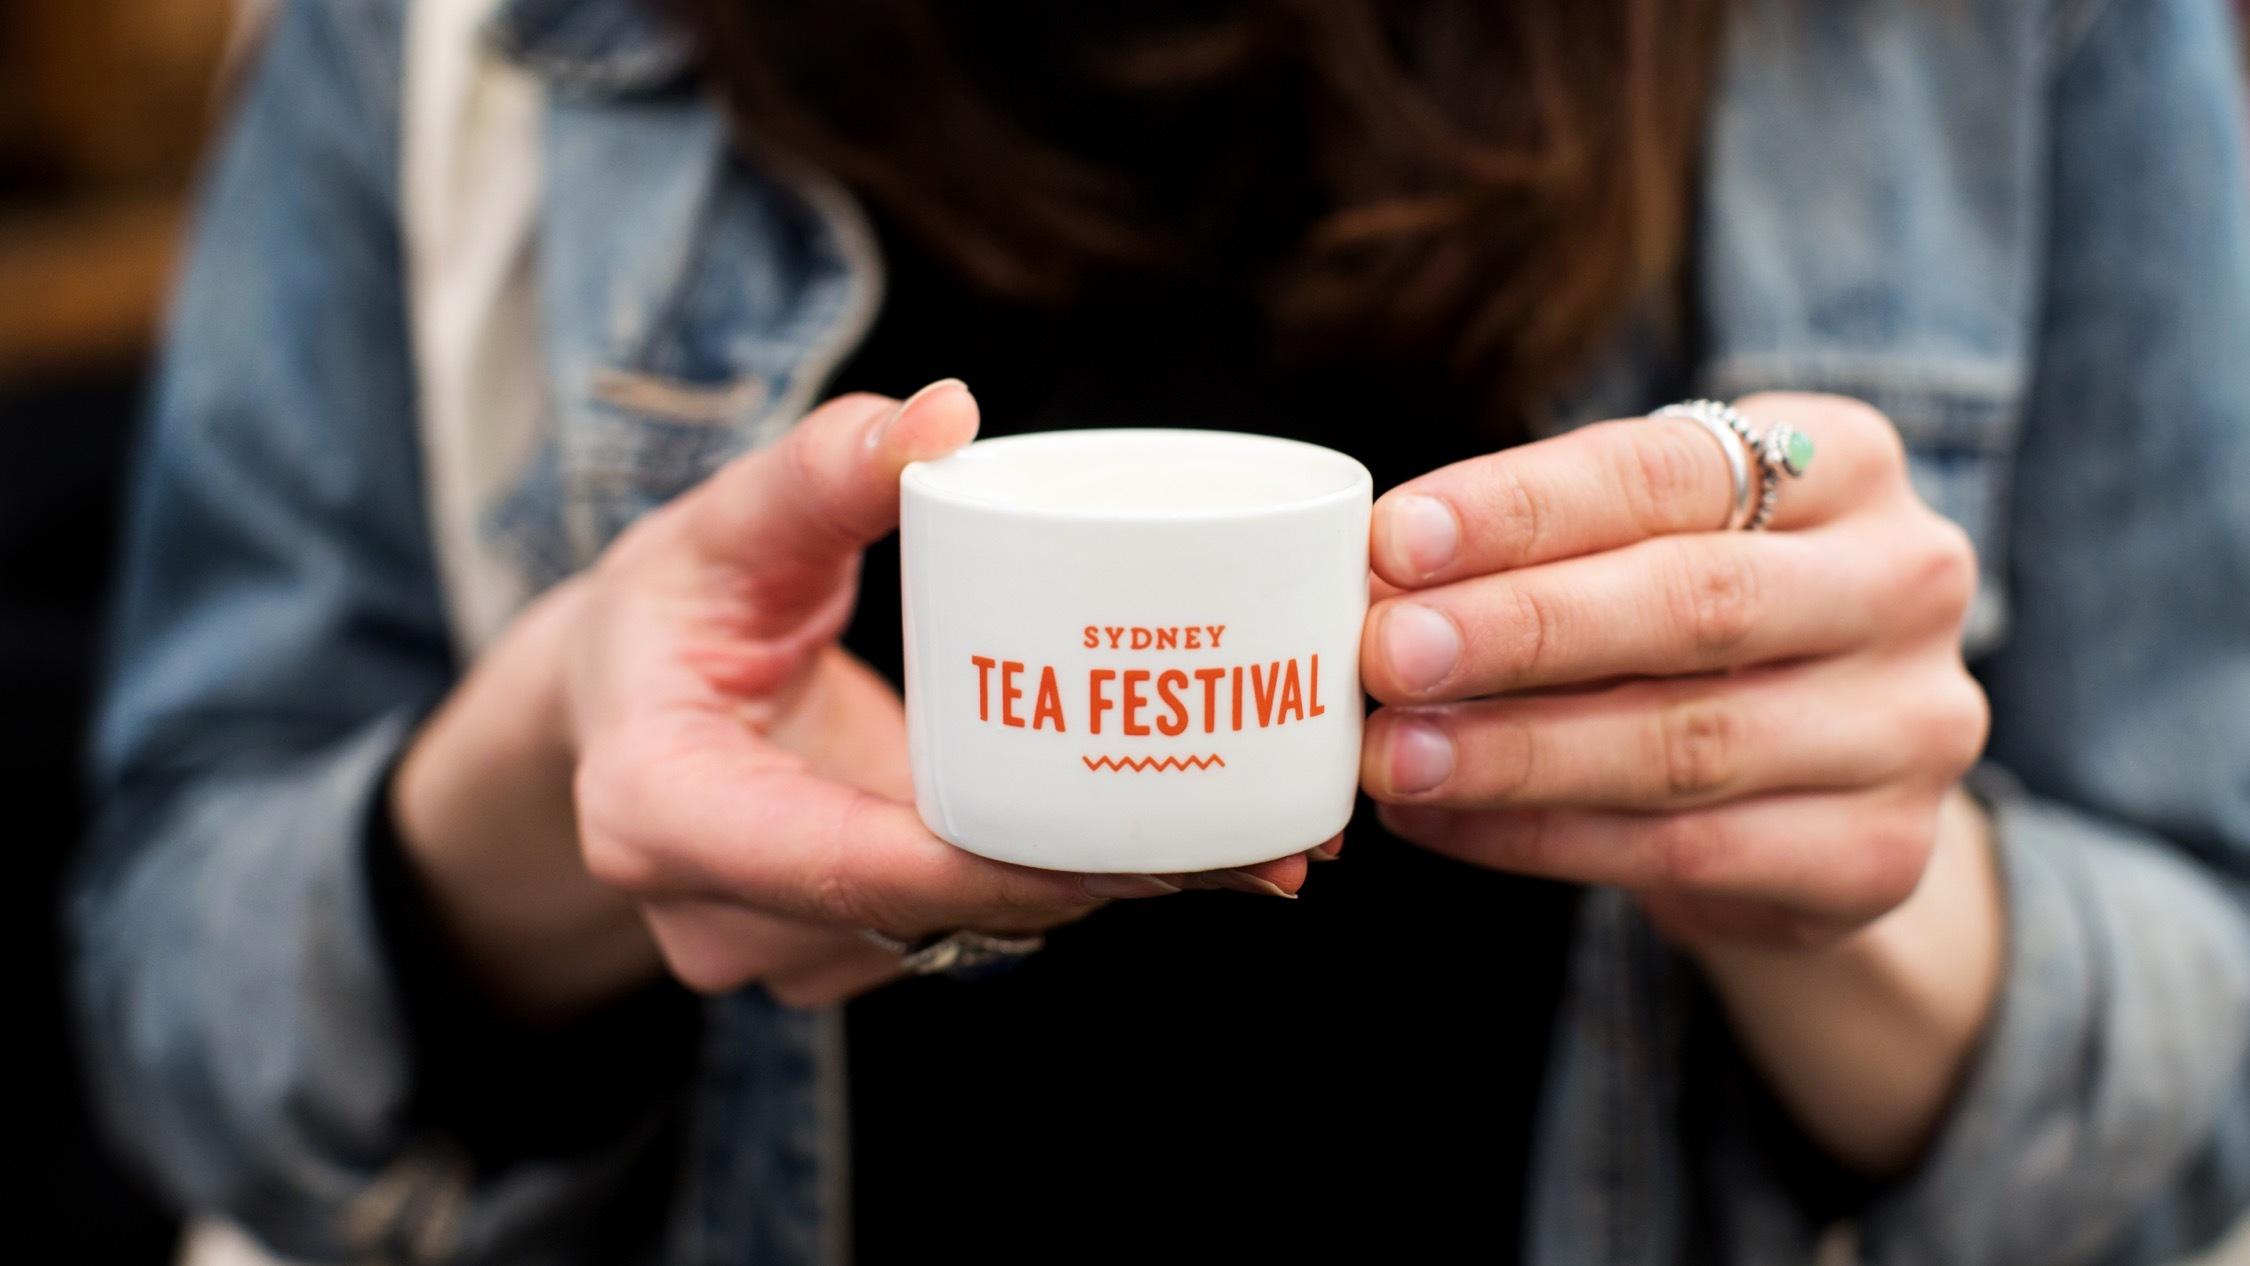 Cup of tea at Sydney Tea Festival